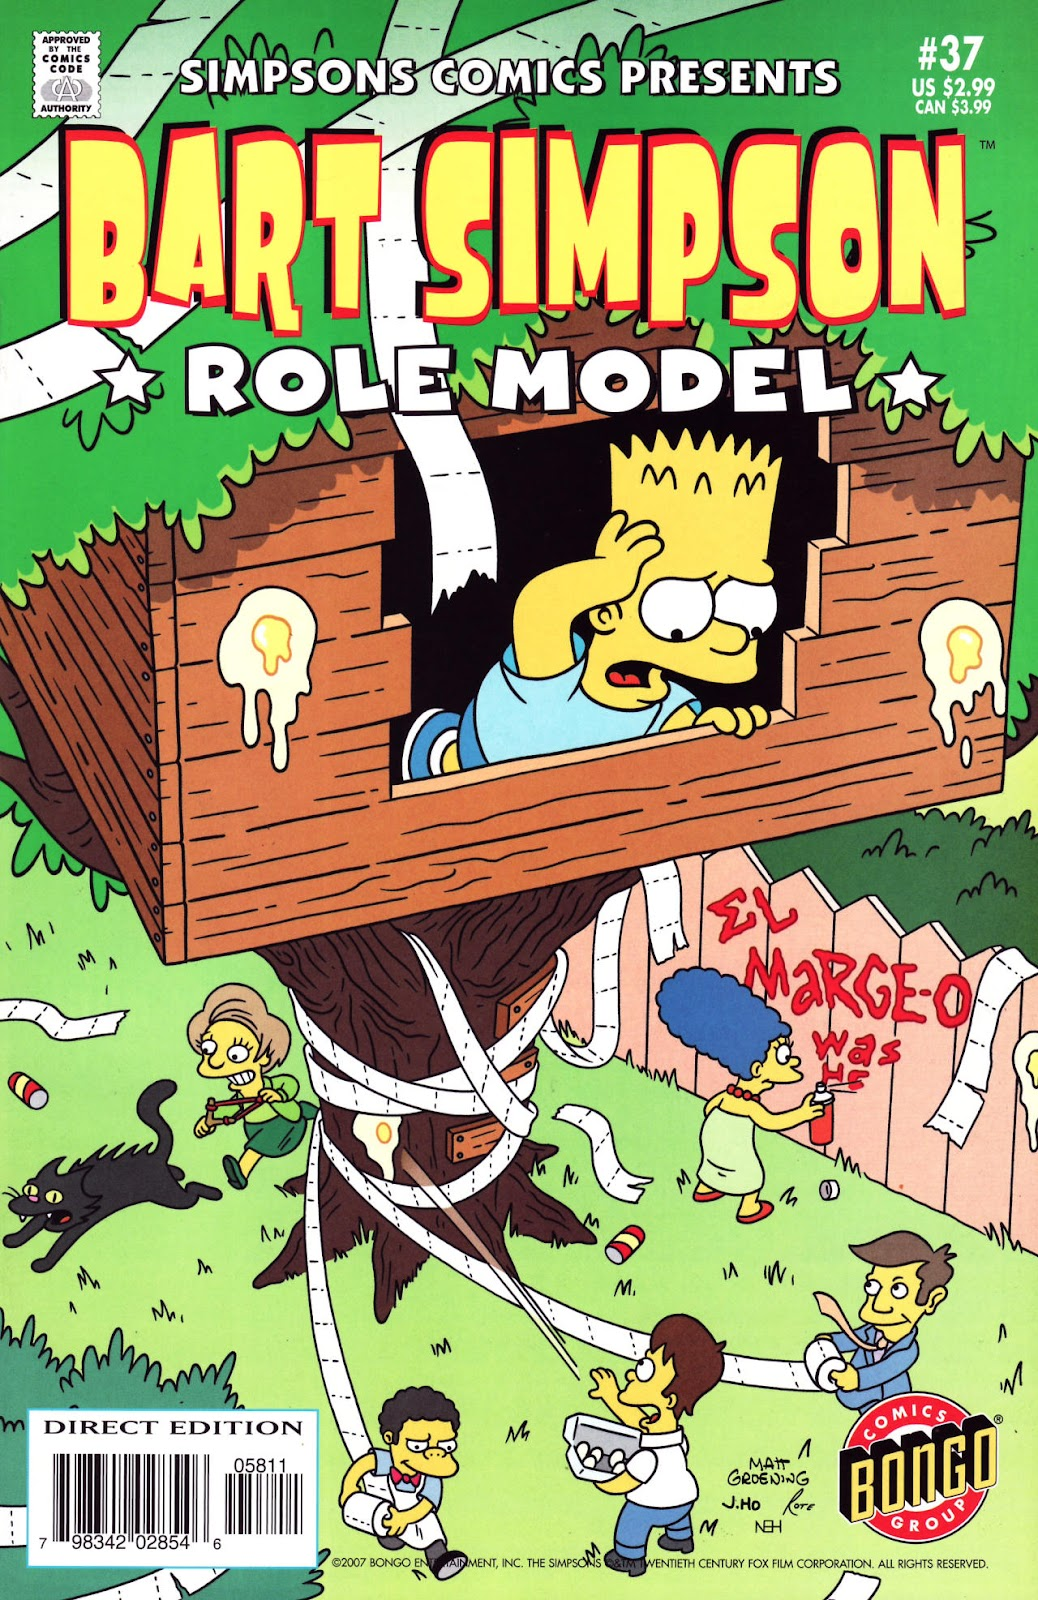 Simpsons Comics Presents Bart Simpson 37 Page 1